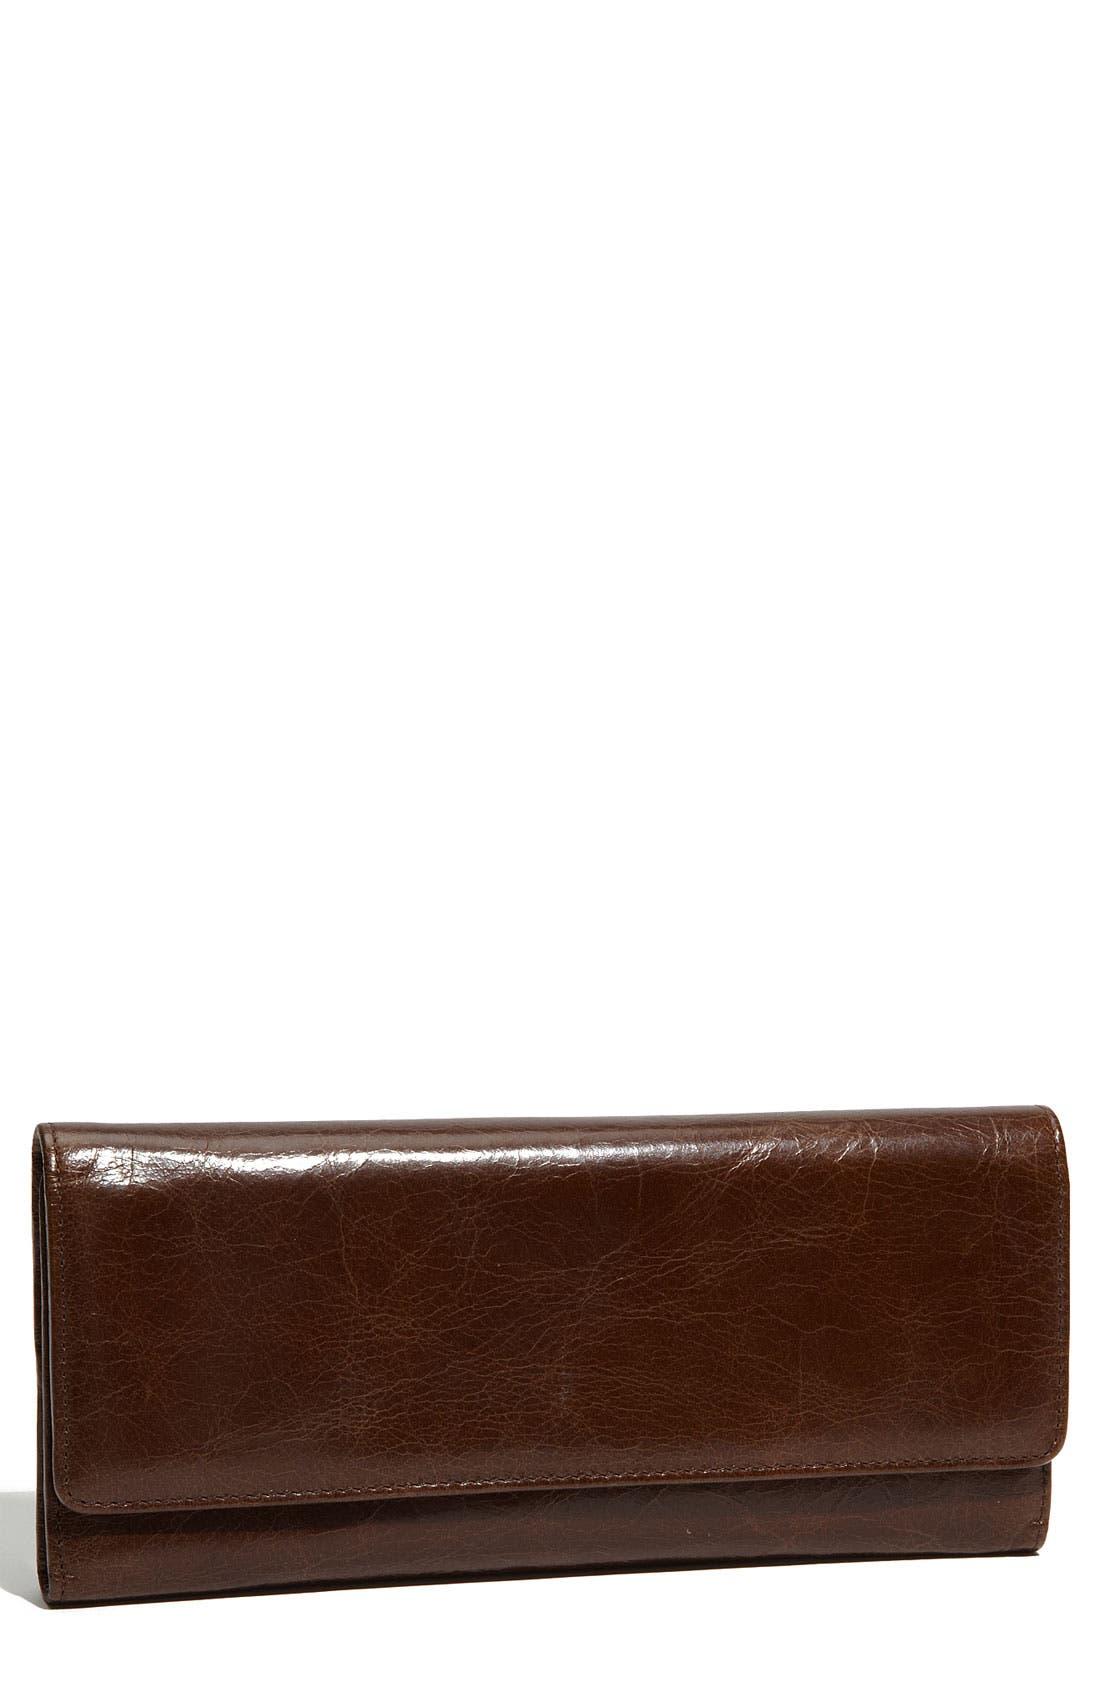 'Sadie' Leather Wallet,                             Main thumbnail 24, color,